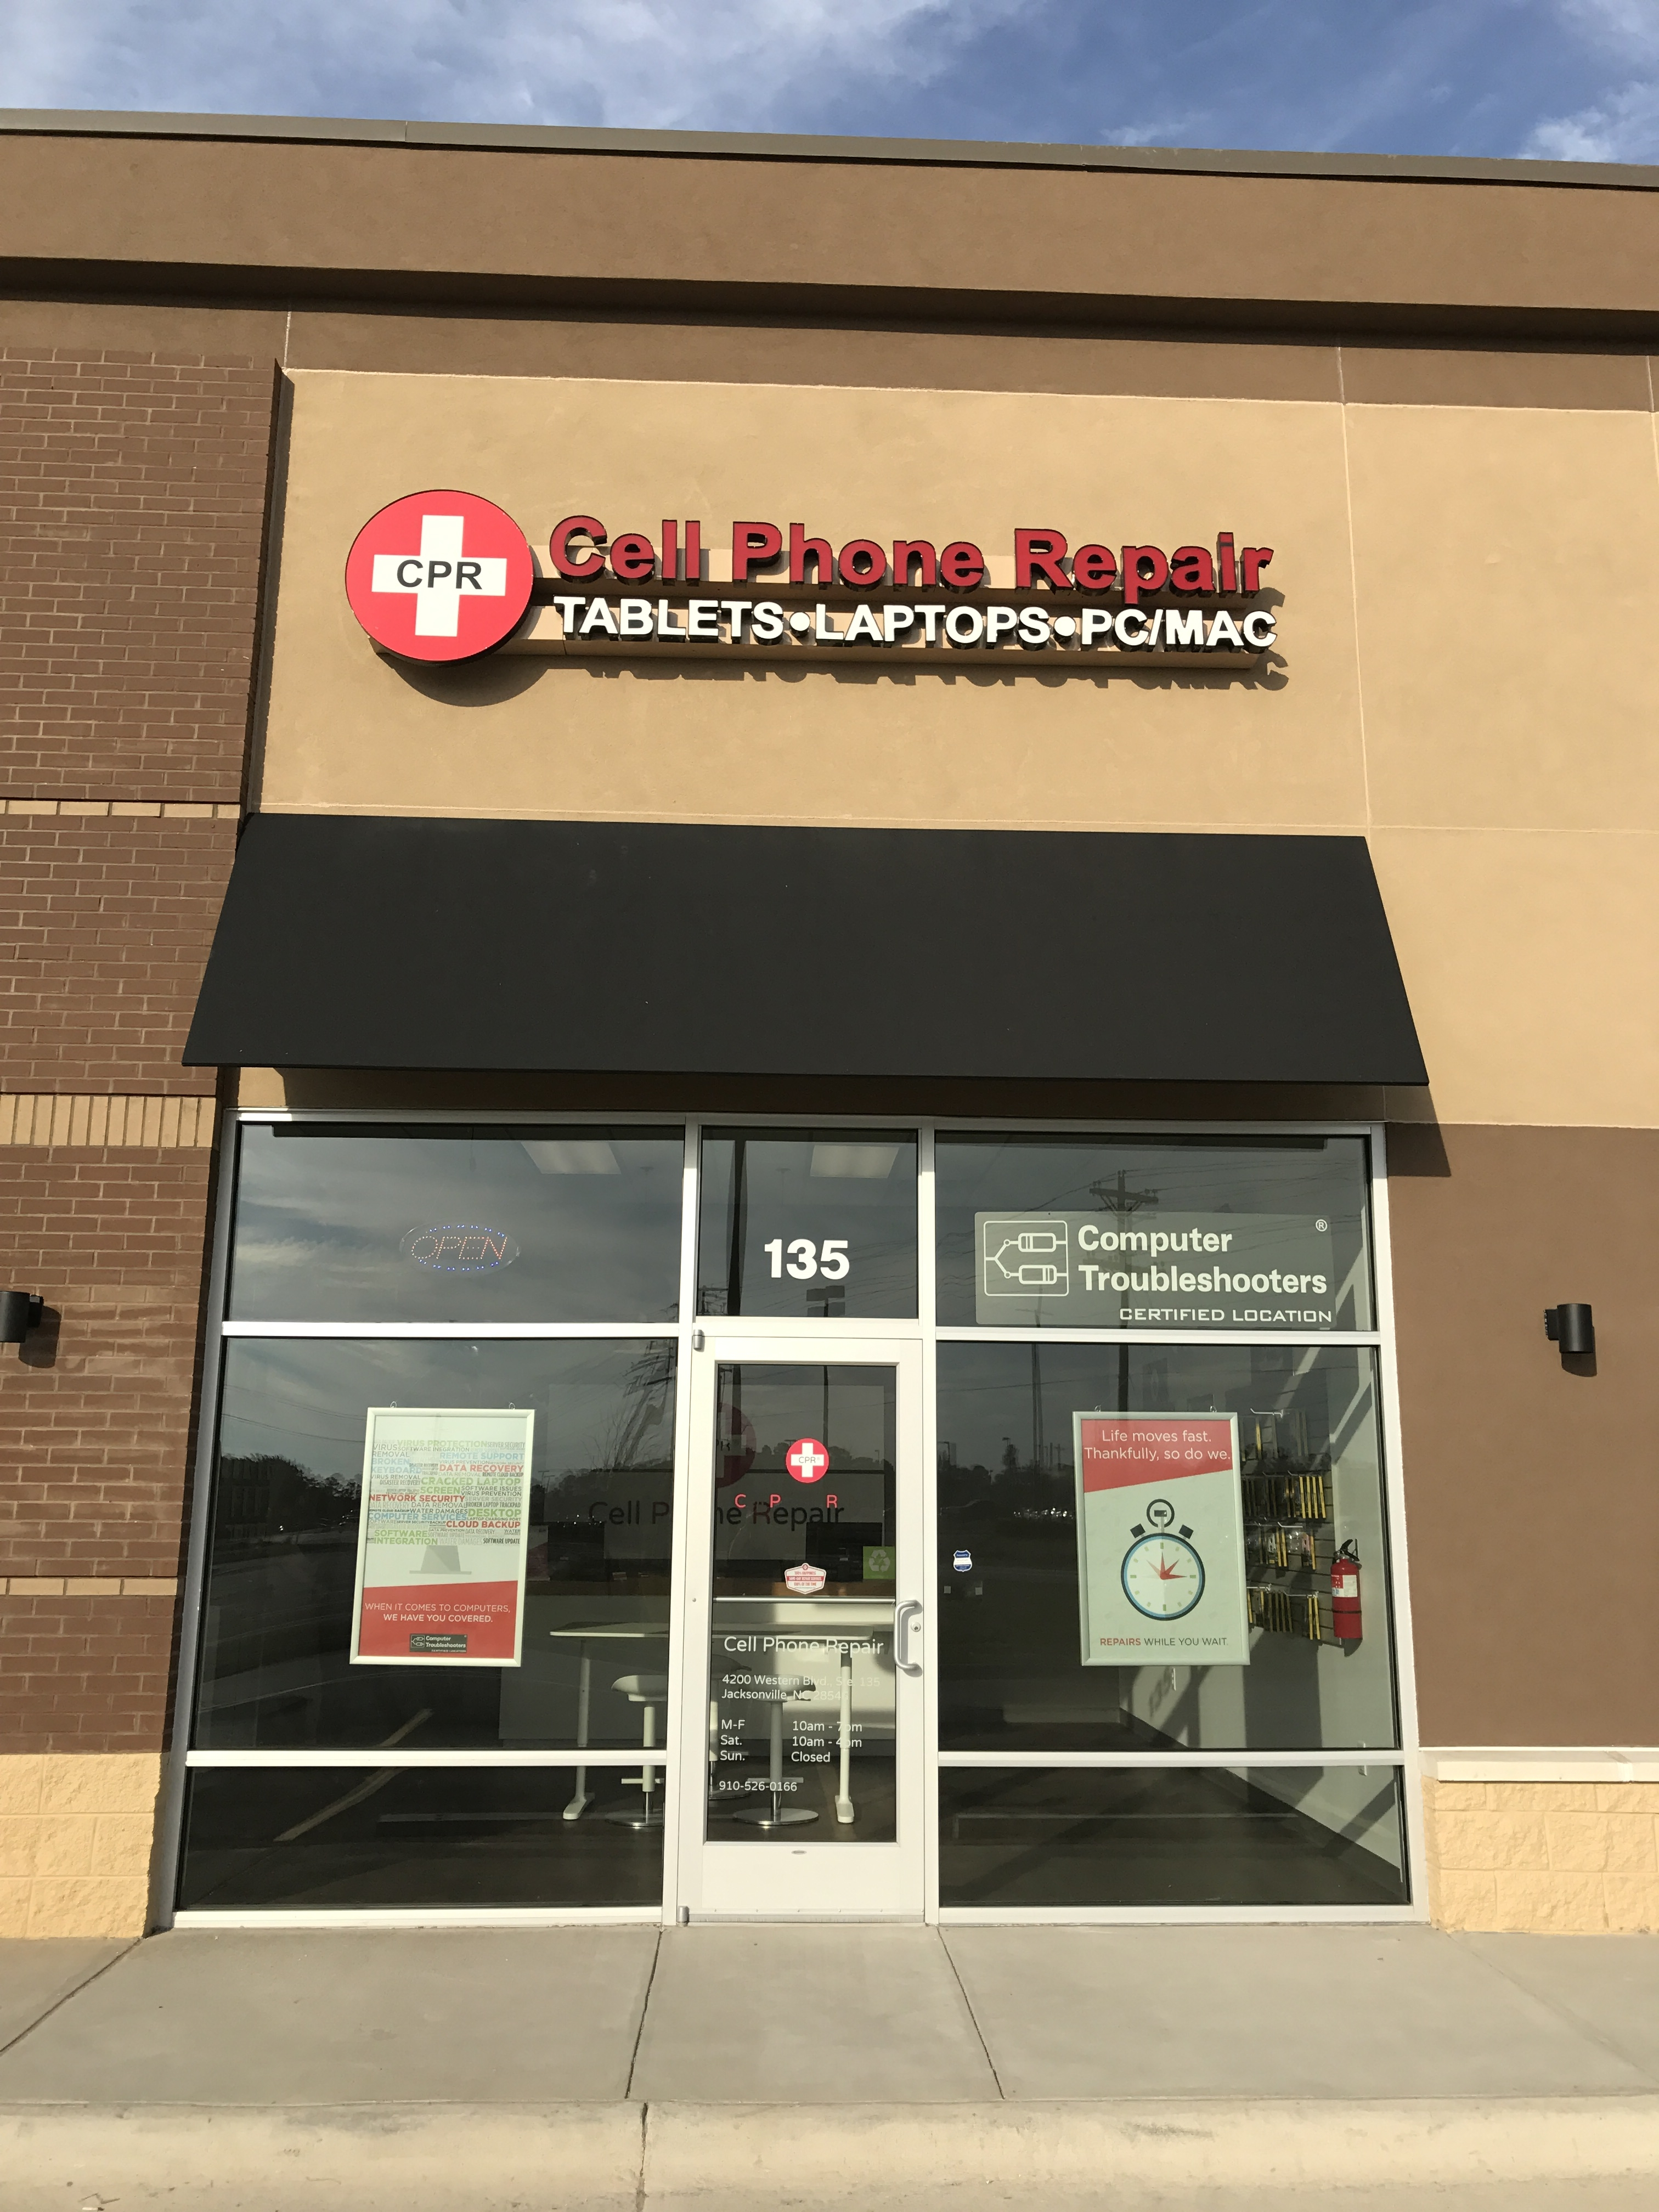 Cpr Cell Phone Repair Jacksonville 4200 Western Blvd Suite 135